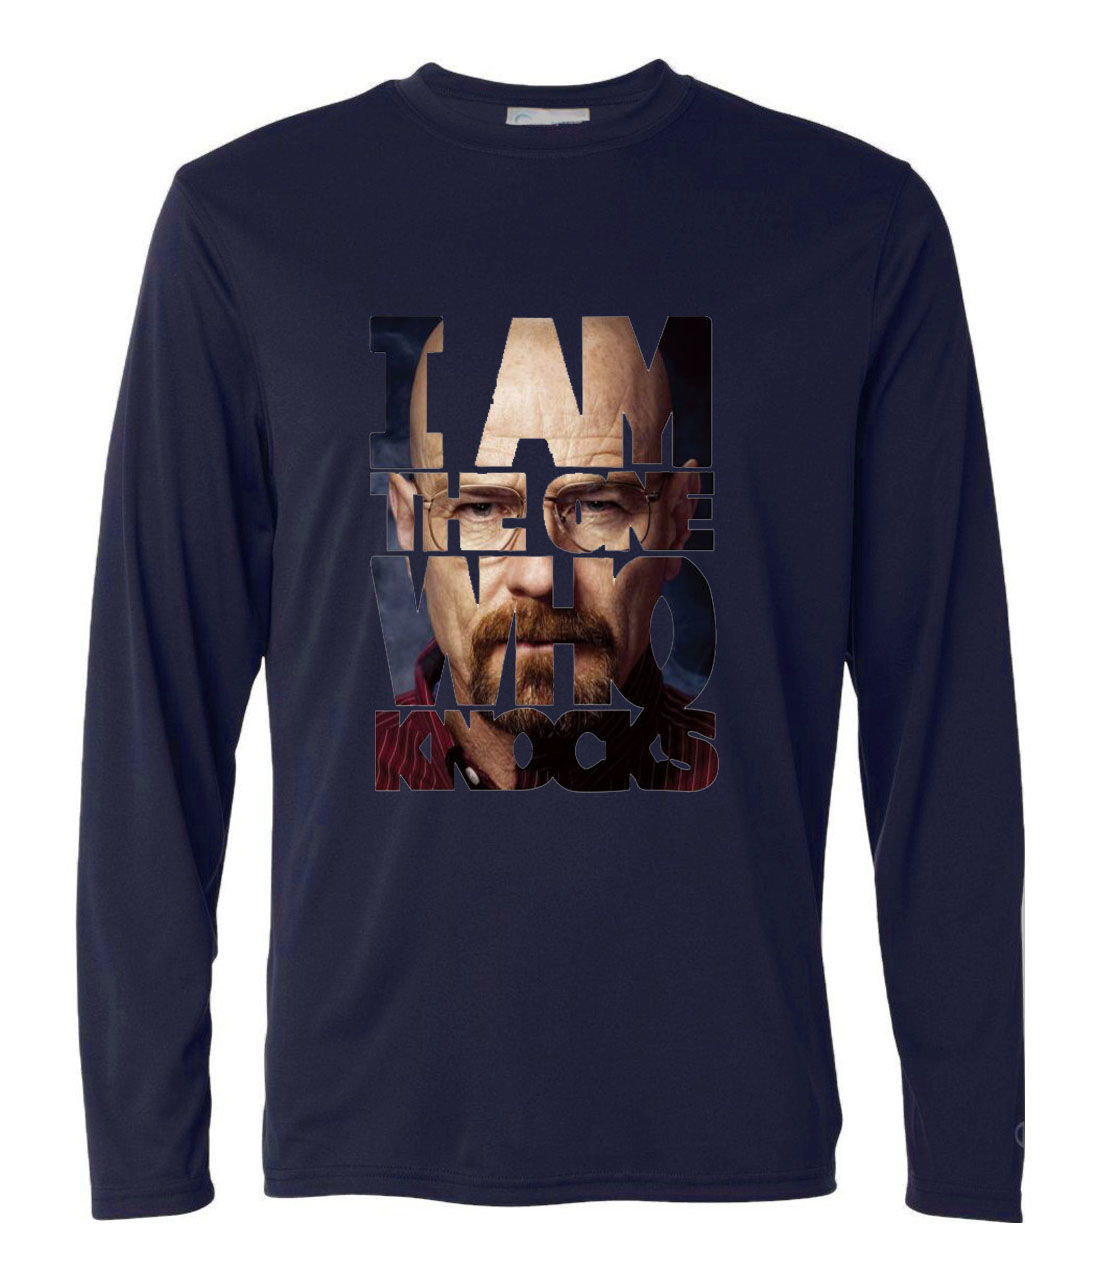 harajuku funny breaking bad t shirt Men 2019 autumn long sleeve Camisetas male casual harajuku brand  hip-hop punk tops tee pp